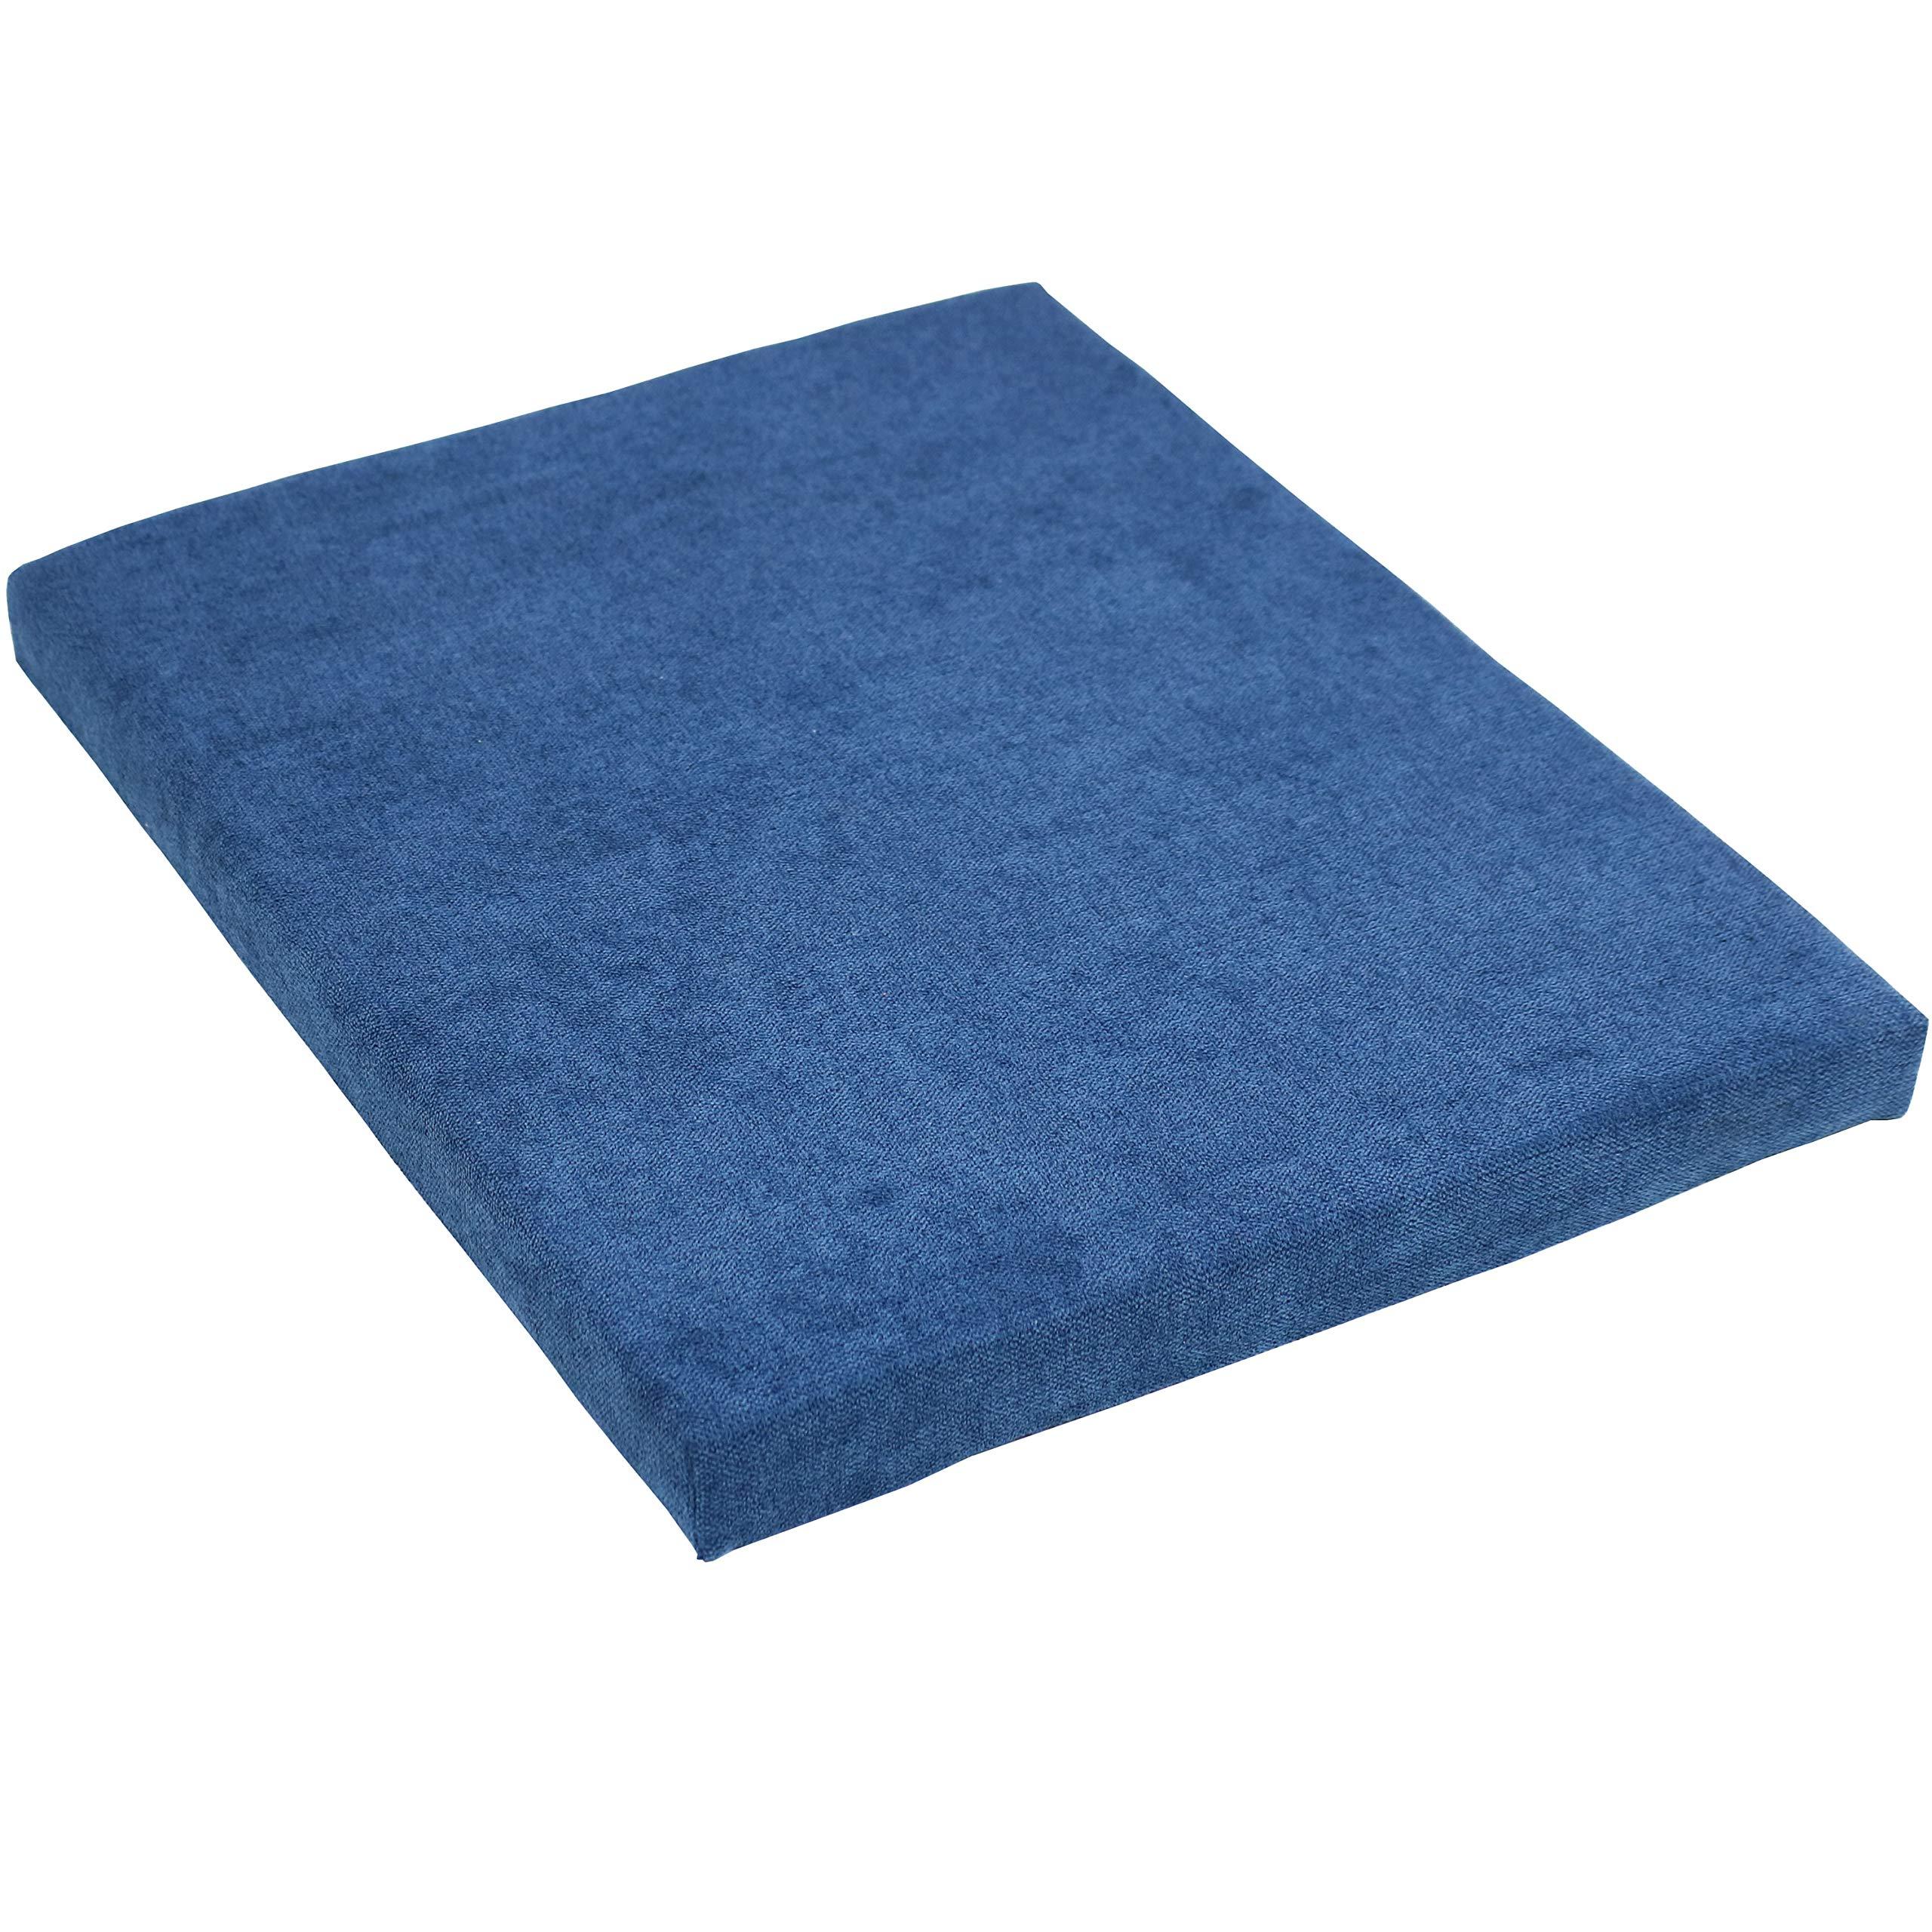 CASL Brands File Cabinet Cushion Seat Top for Mobile Pedestals, Magnetic Back, Blue